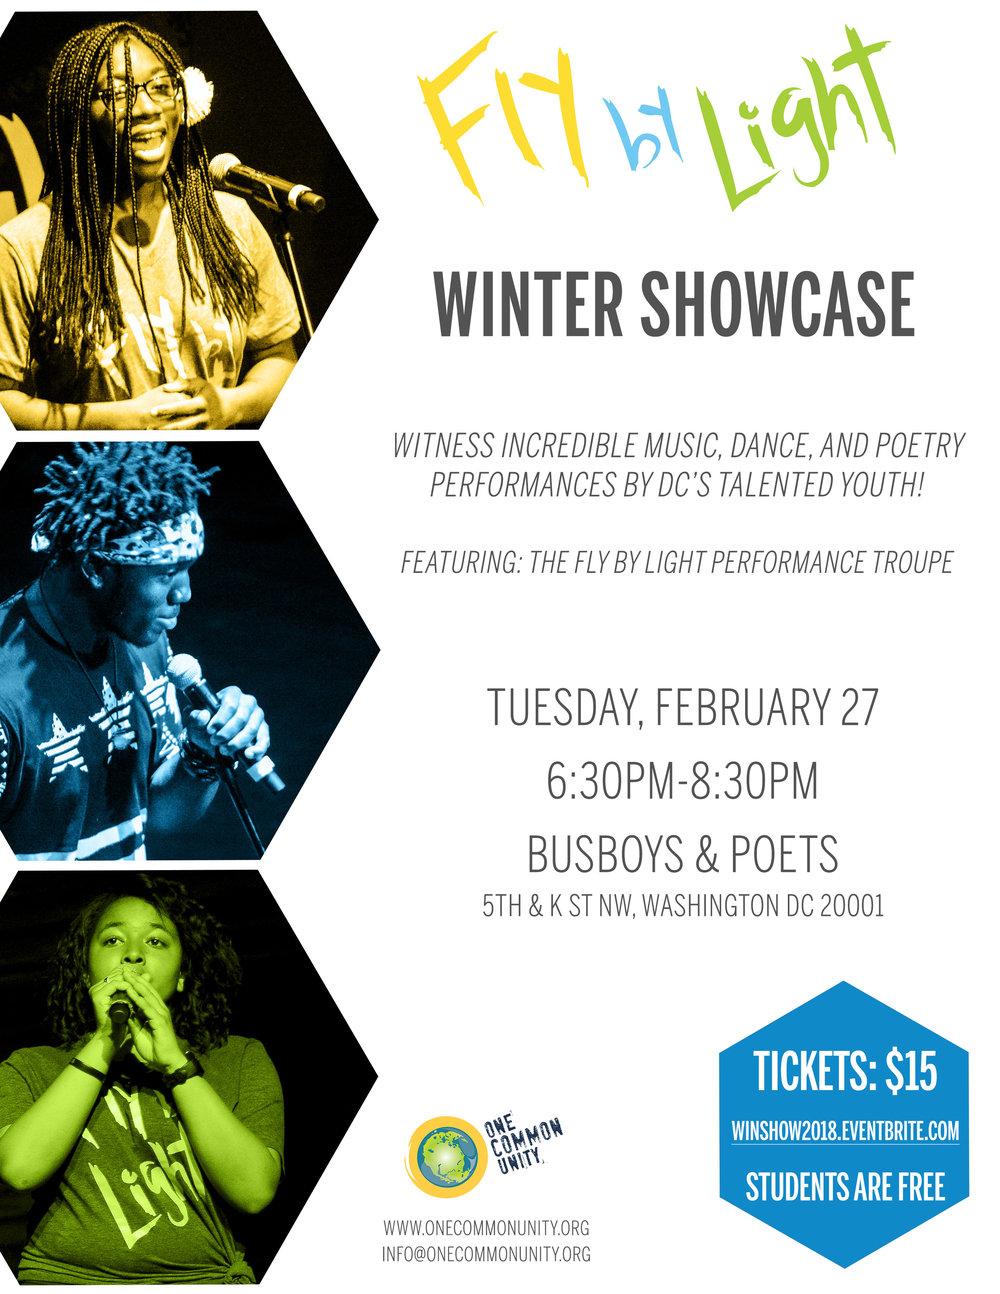 2018 Winter Showcase flyer.jpg